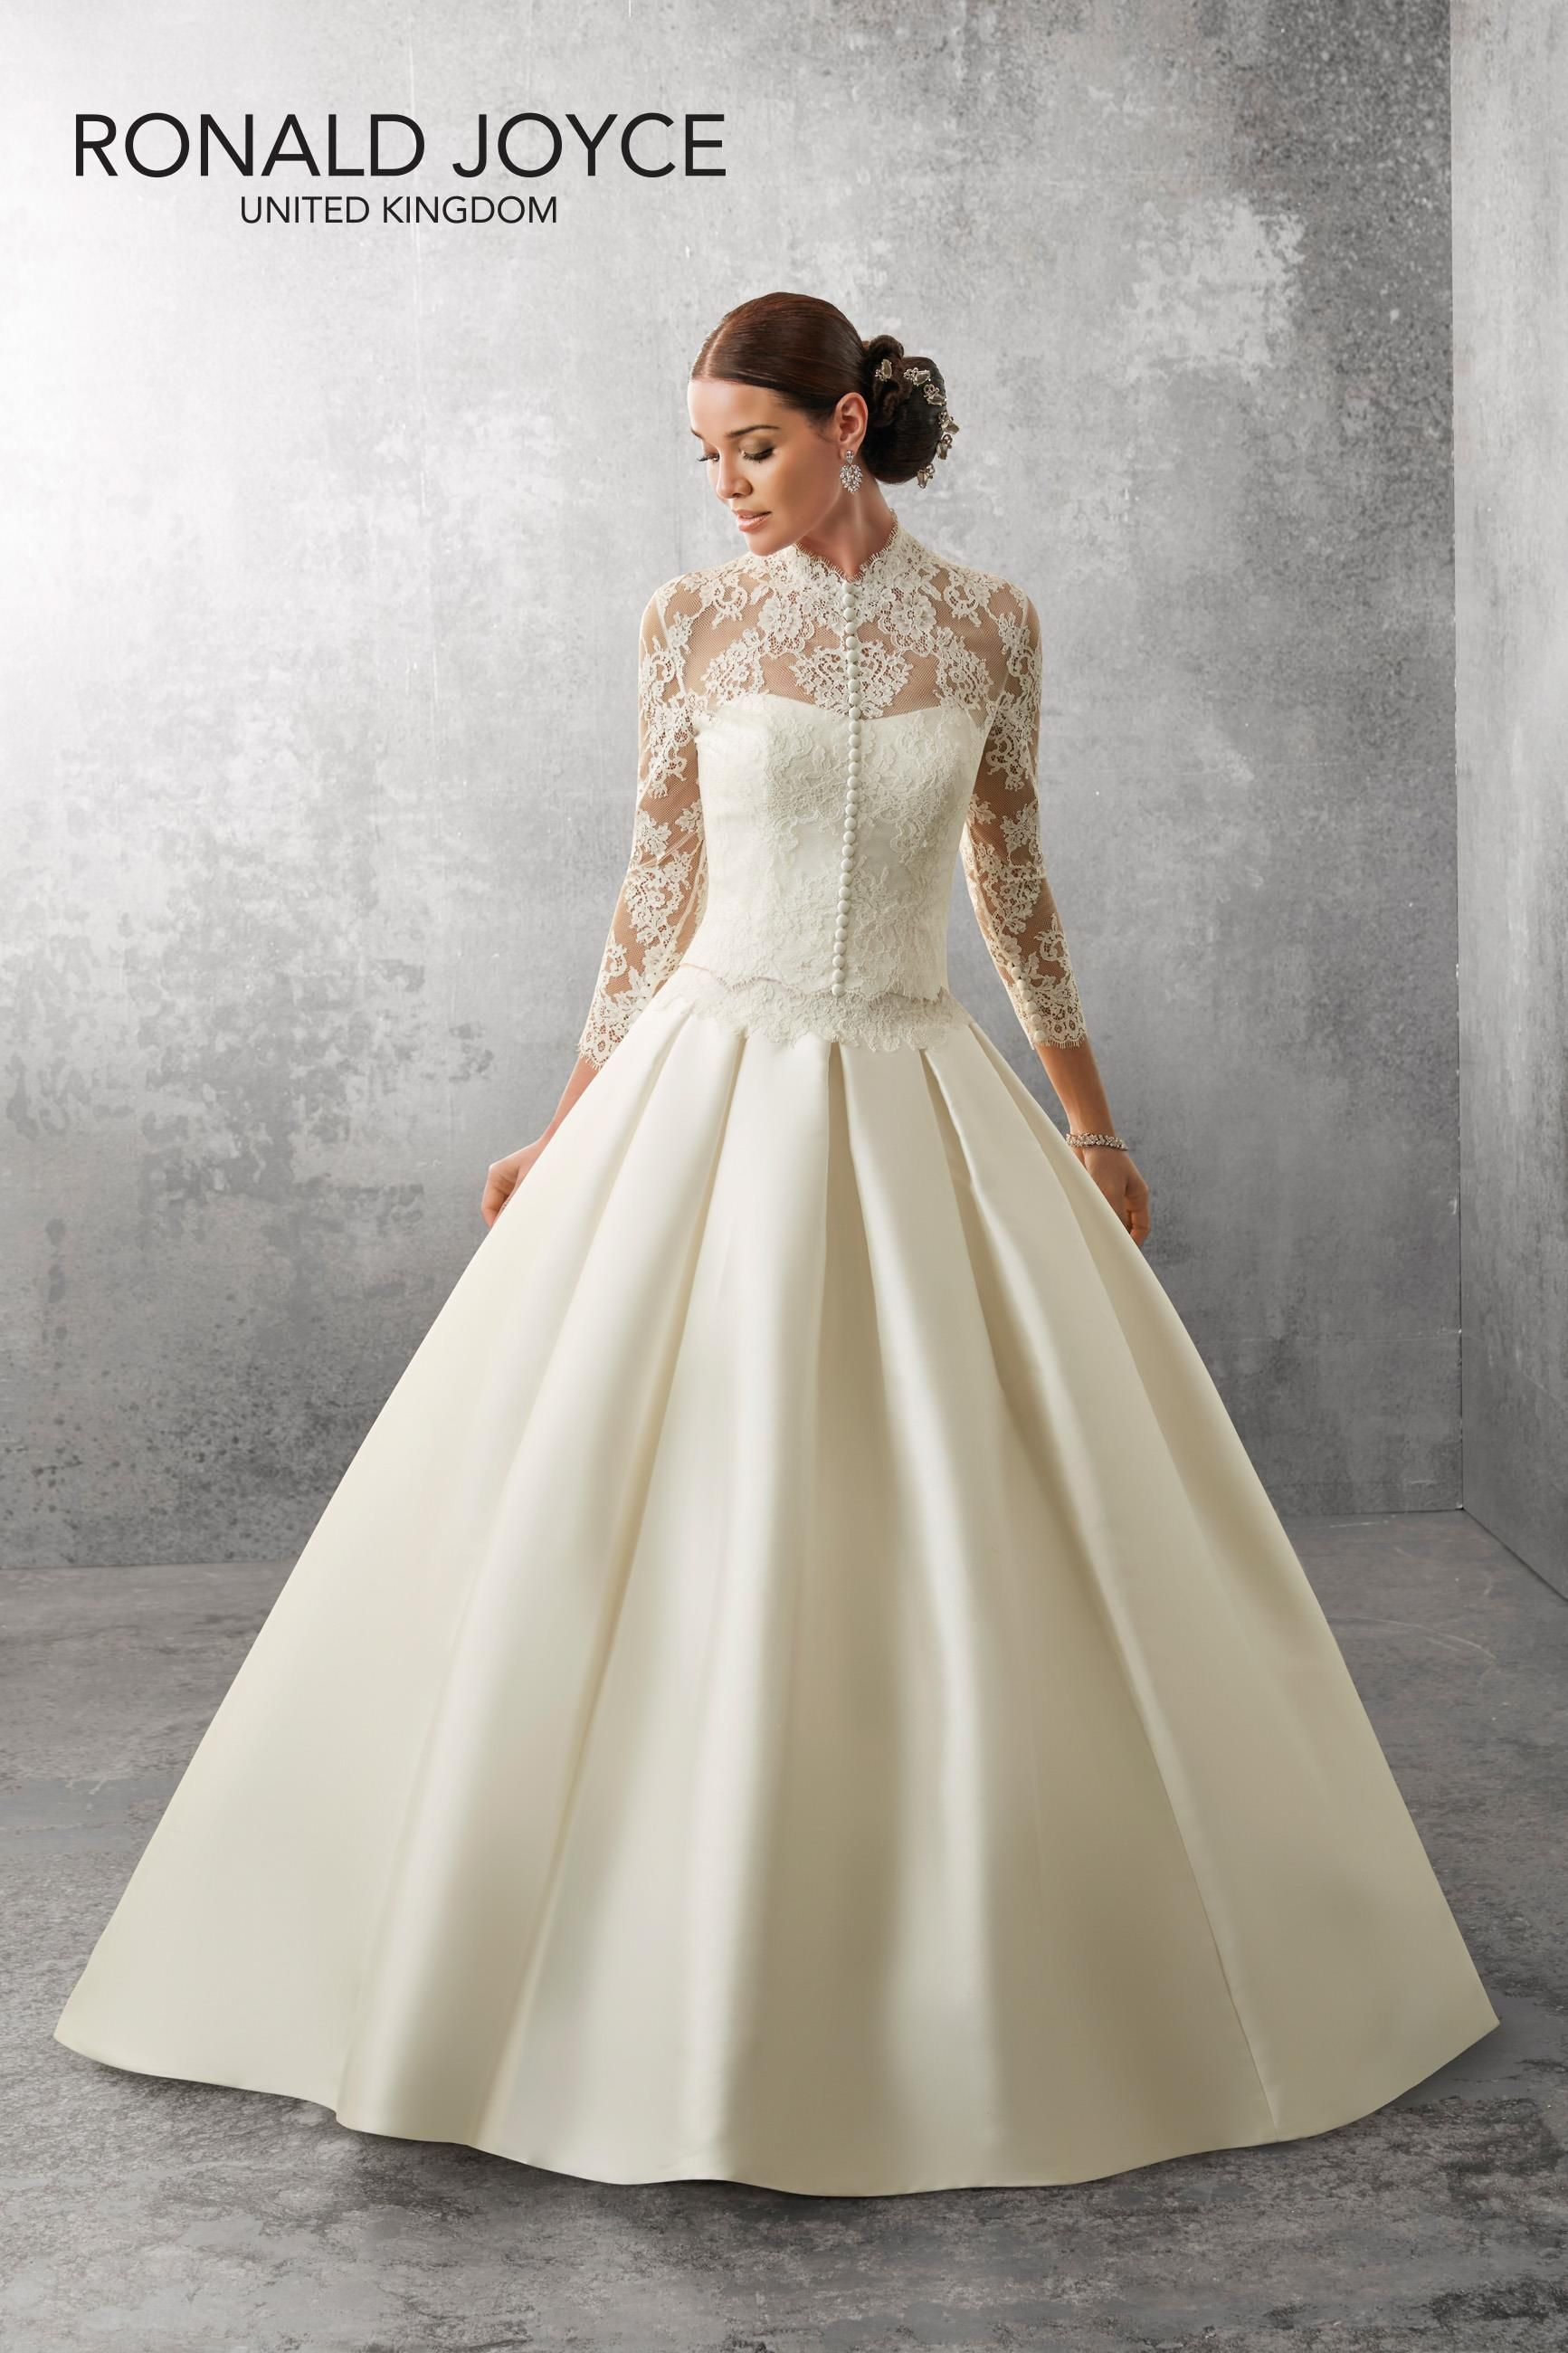 Pin by Rebecca Sunman on wedding dress shortlist | Pinterest ...